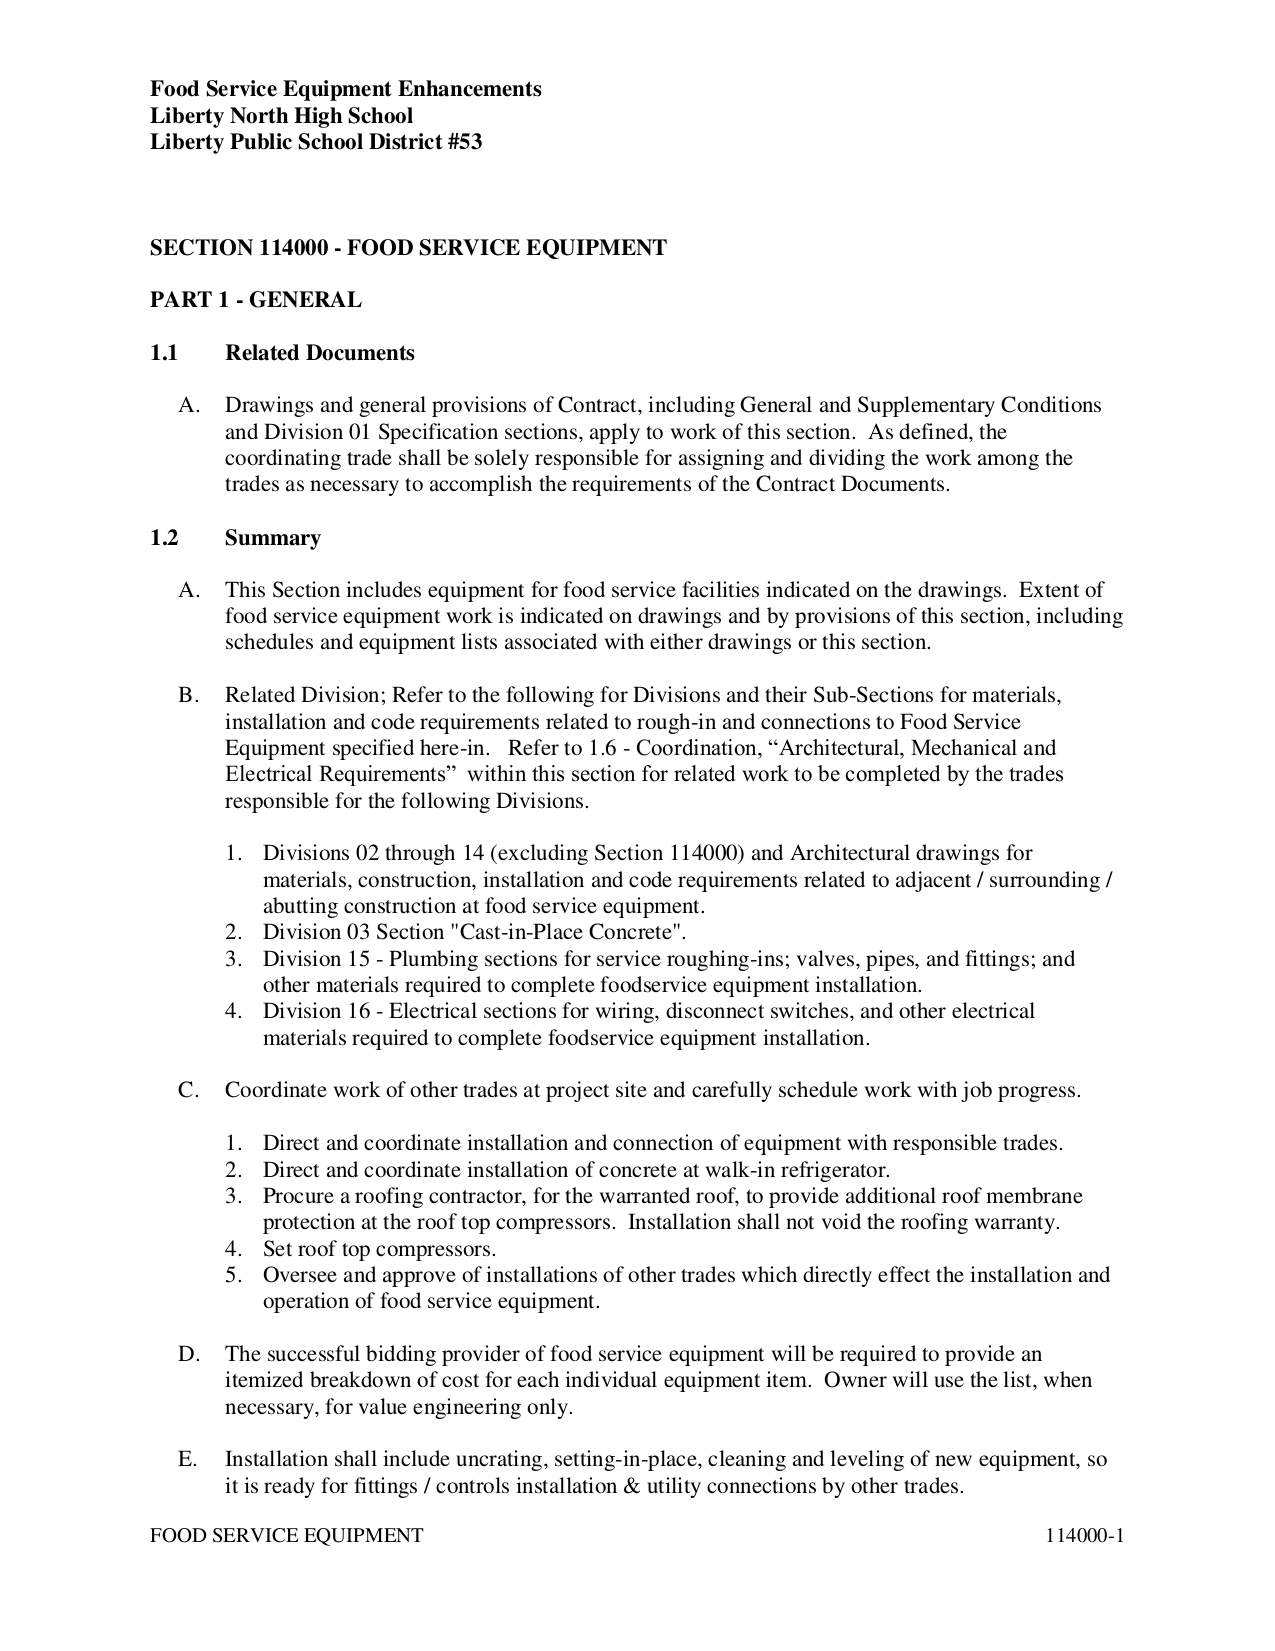 pdf for Hussmann Other IMPACT D6 Merchandisers manual